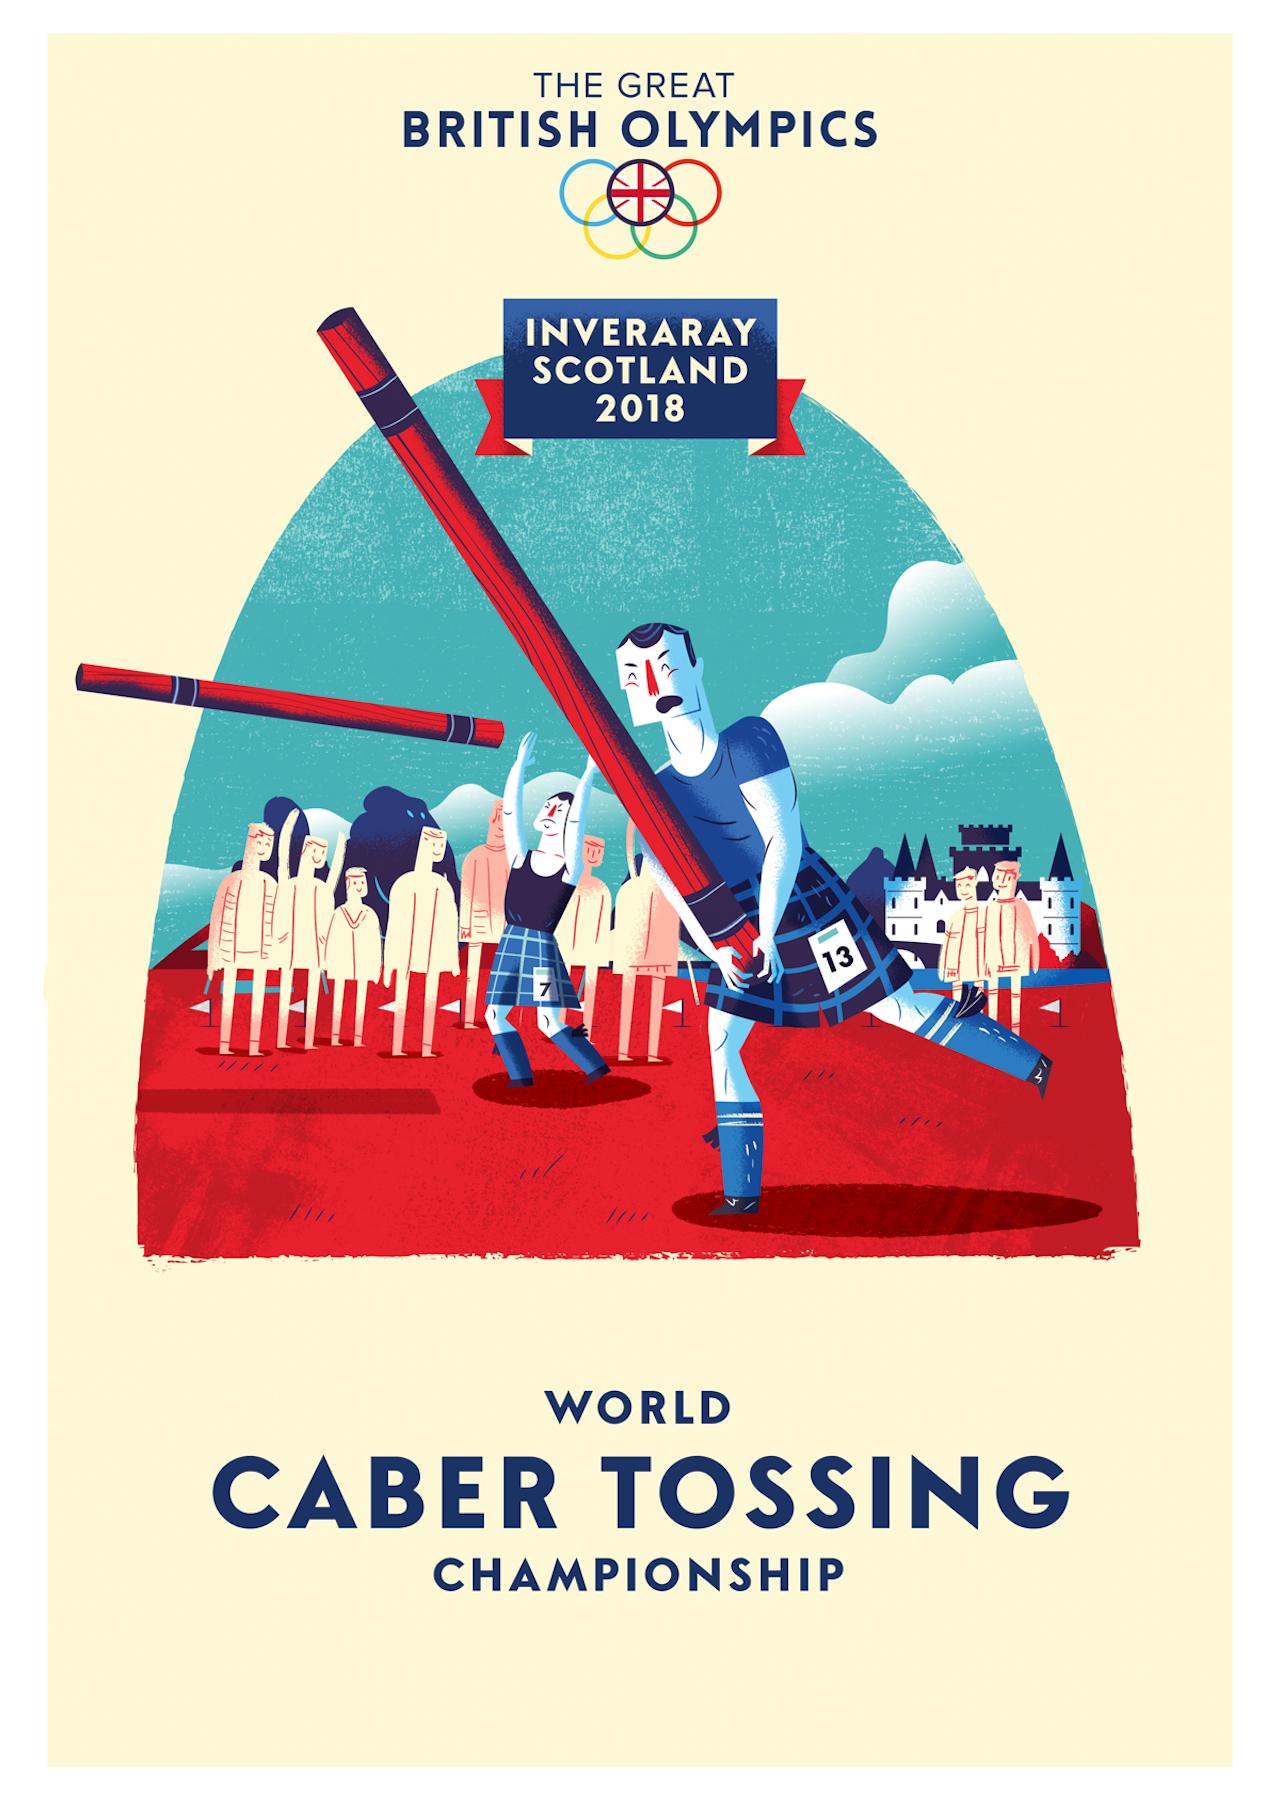 British Olympics_06 Caber Tossing (1)